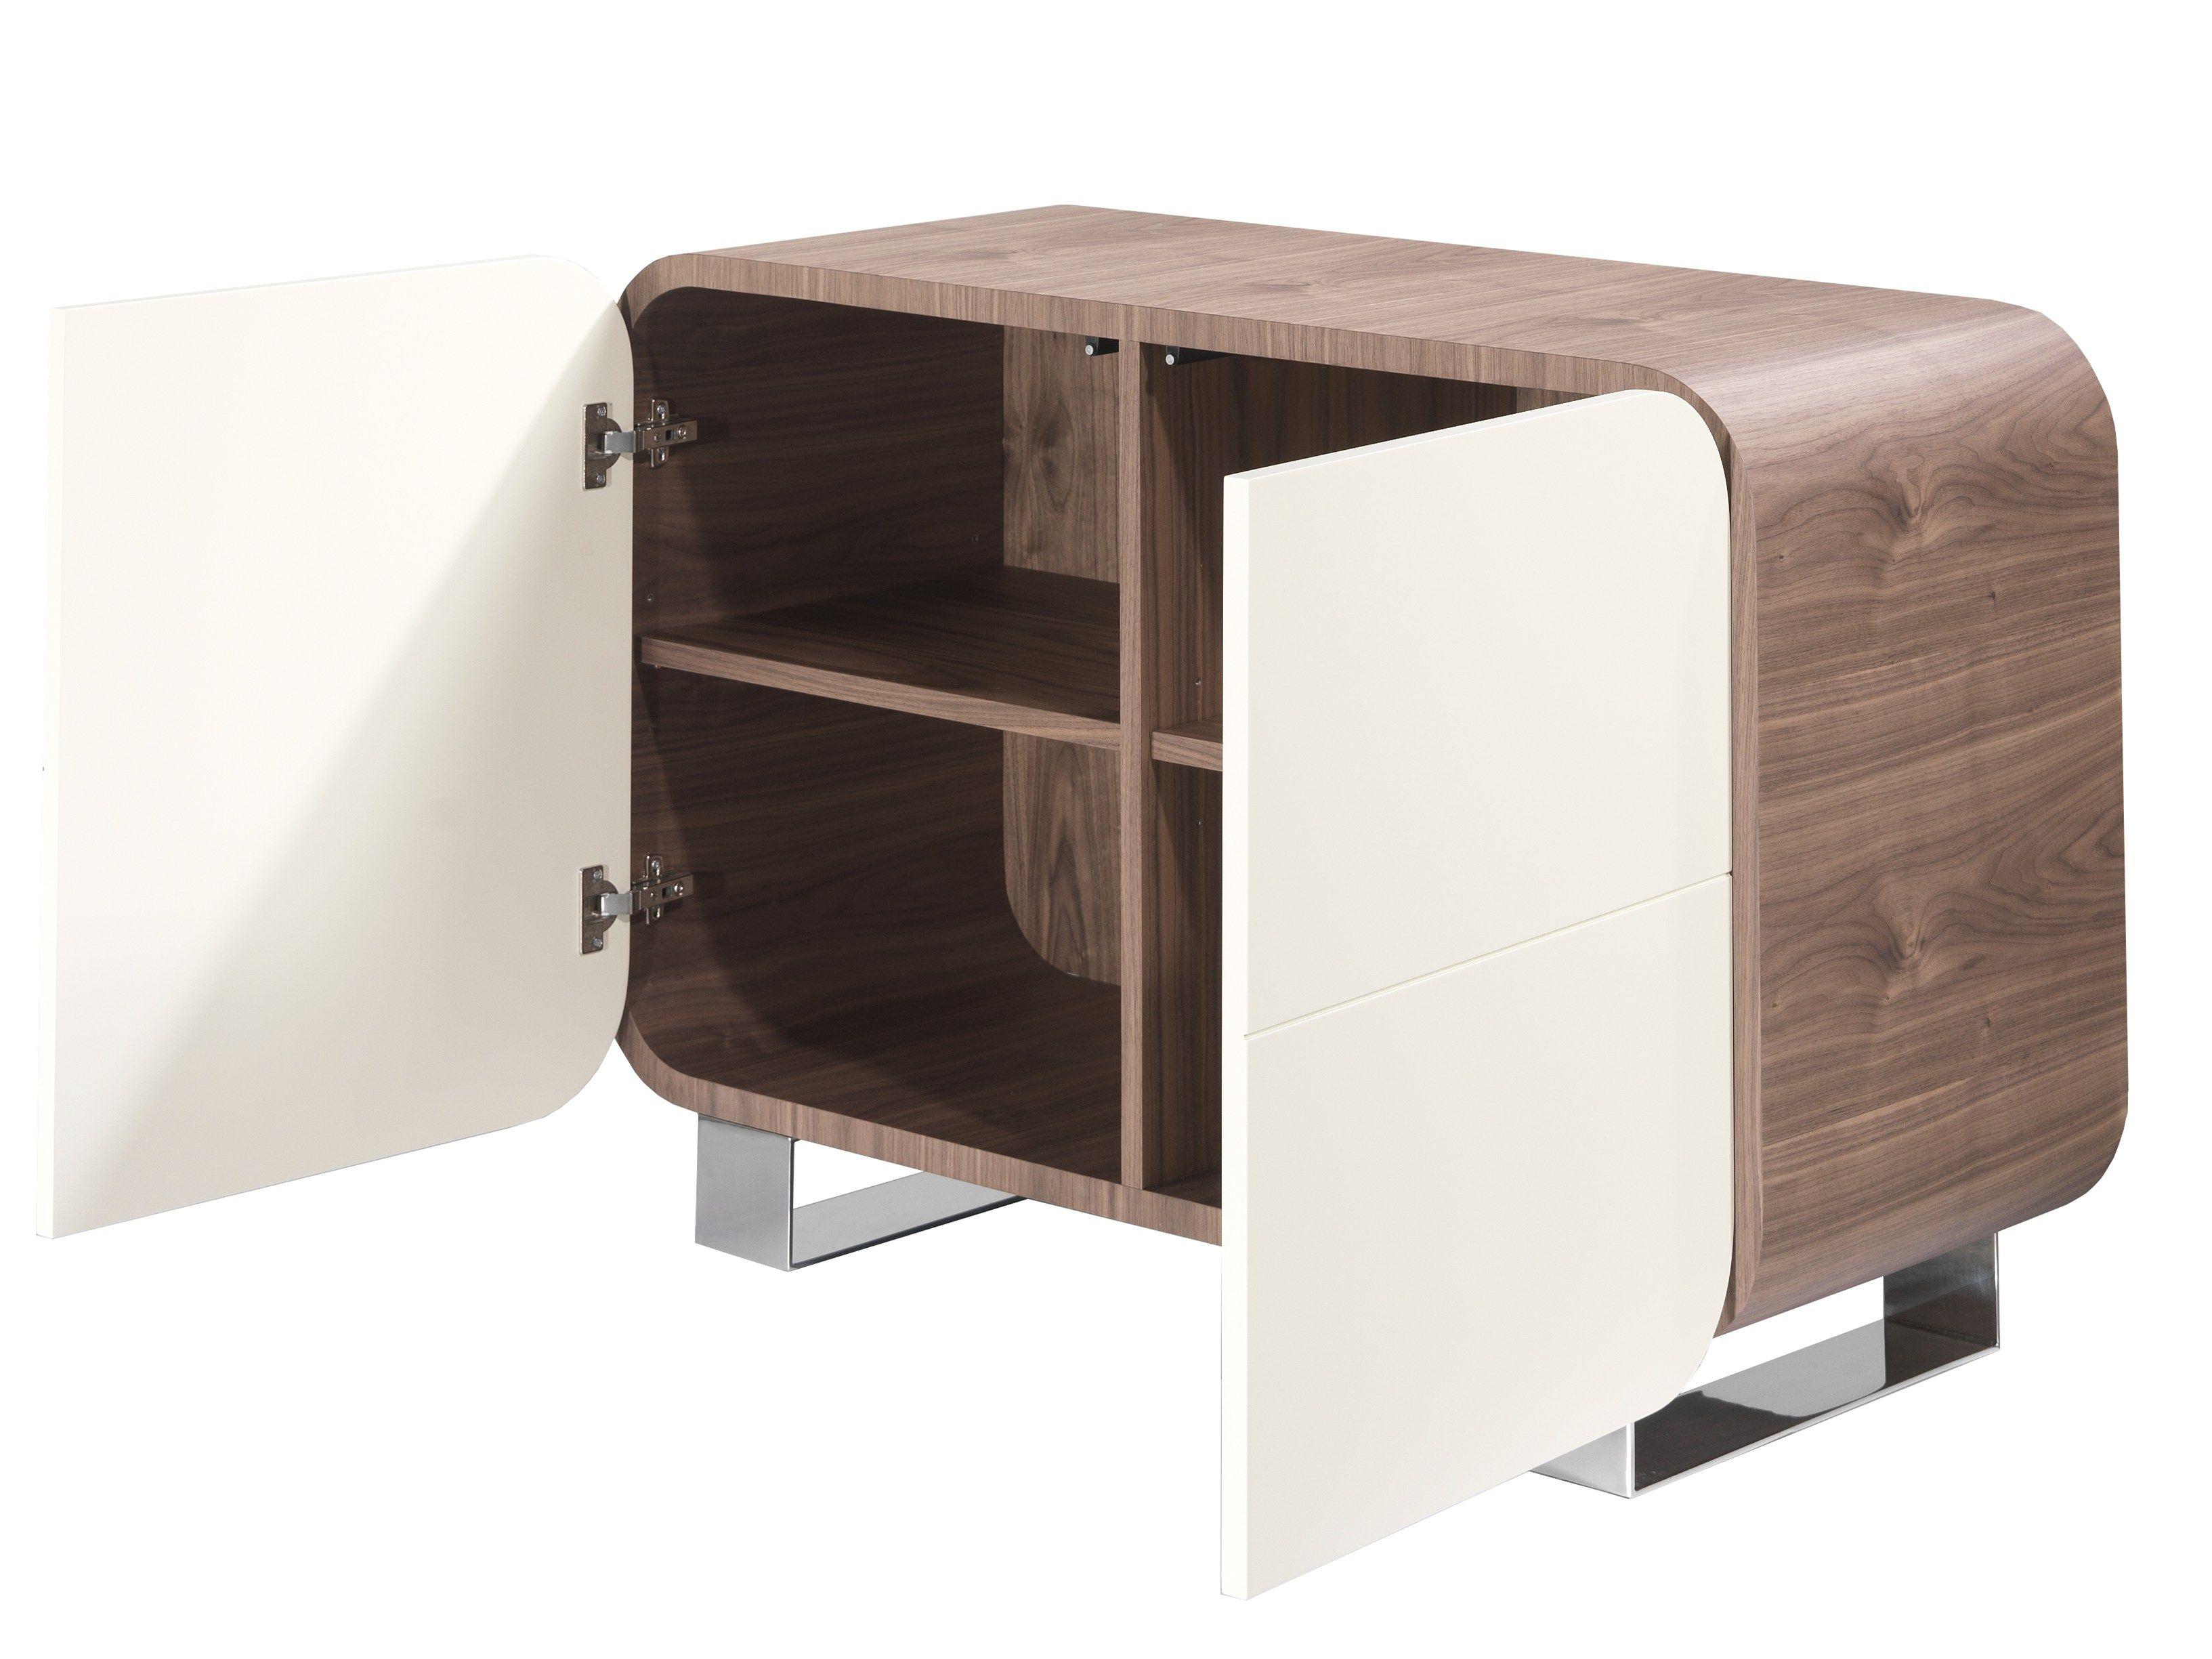 meuble de rangement laqu avec portes petit marly by azea design victor caetano. Black Bedroom Furniture Sets. Home Design Ideas